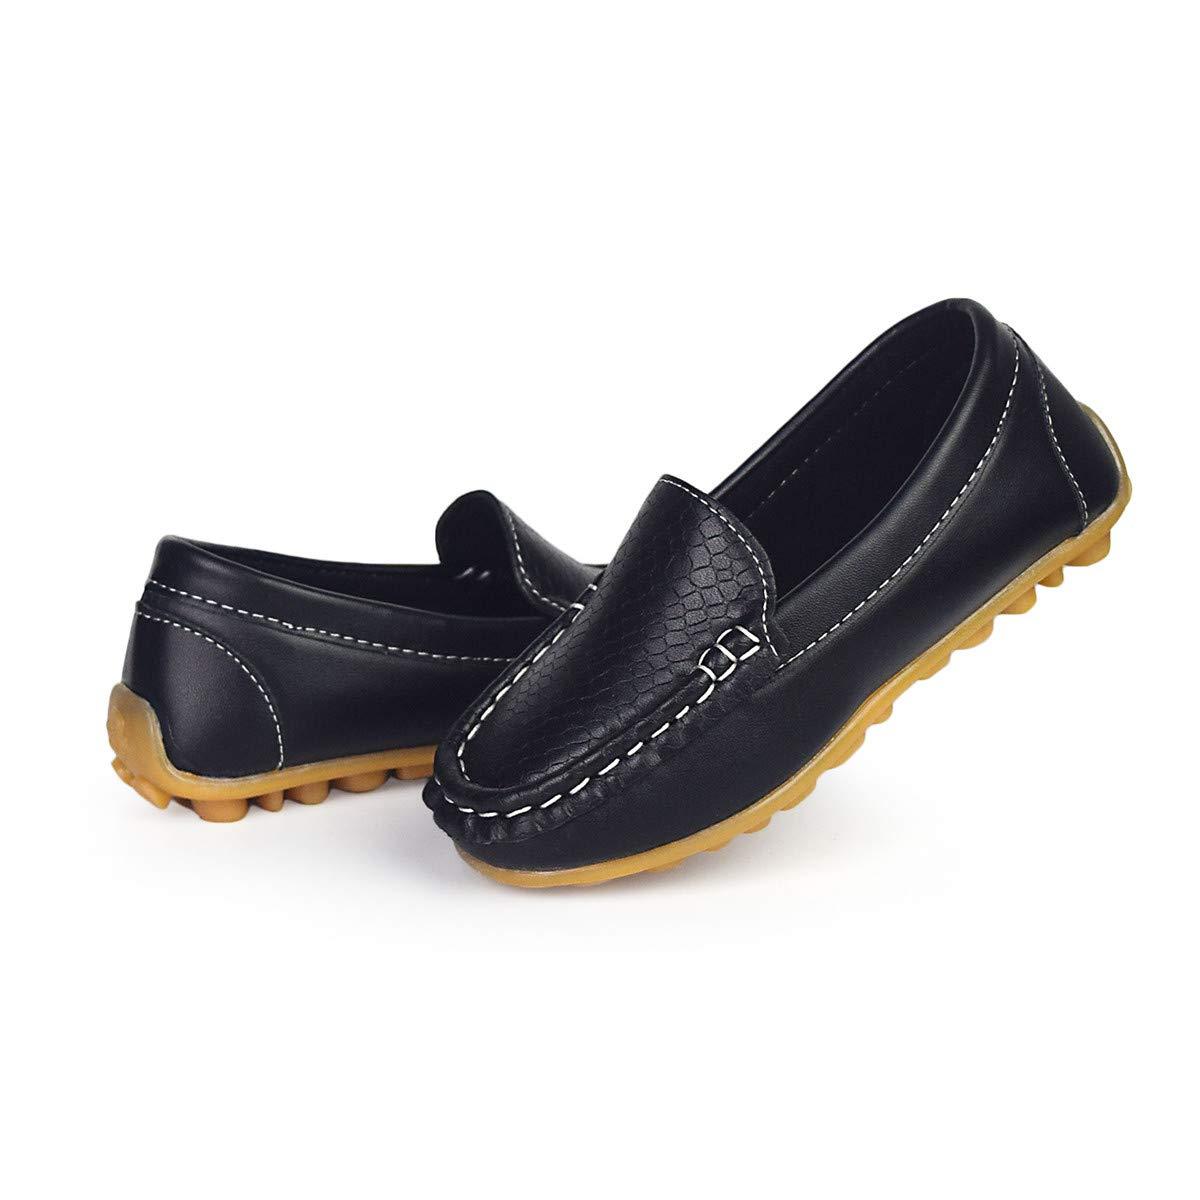 Sakuracan Boys Girls Leather Loafers Slip-on Boat Dress-Shoes (Toddler/Little Kid) by Sakuracan (Image #3)